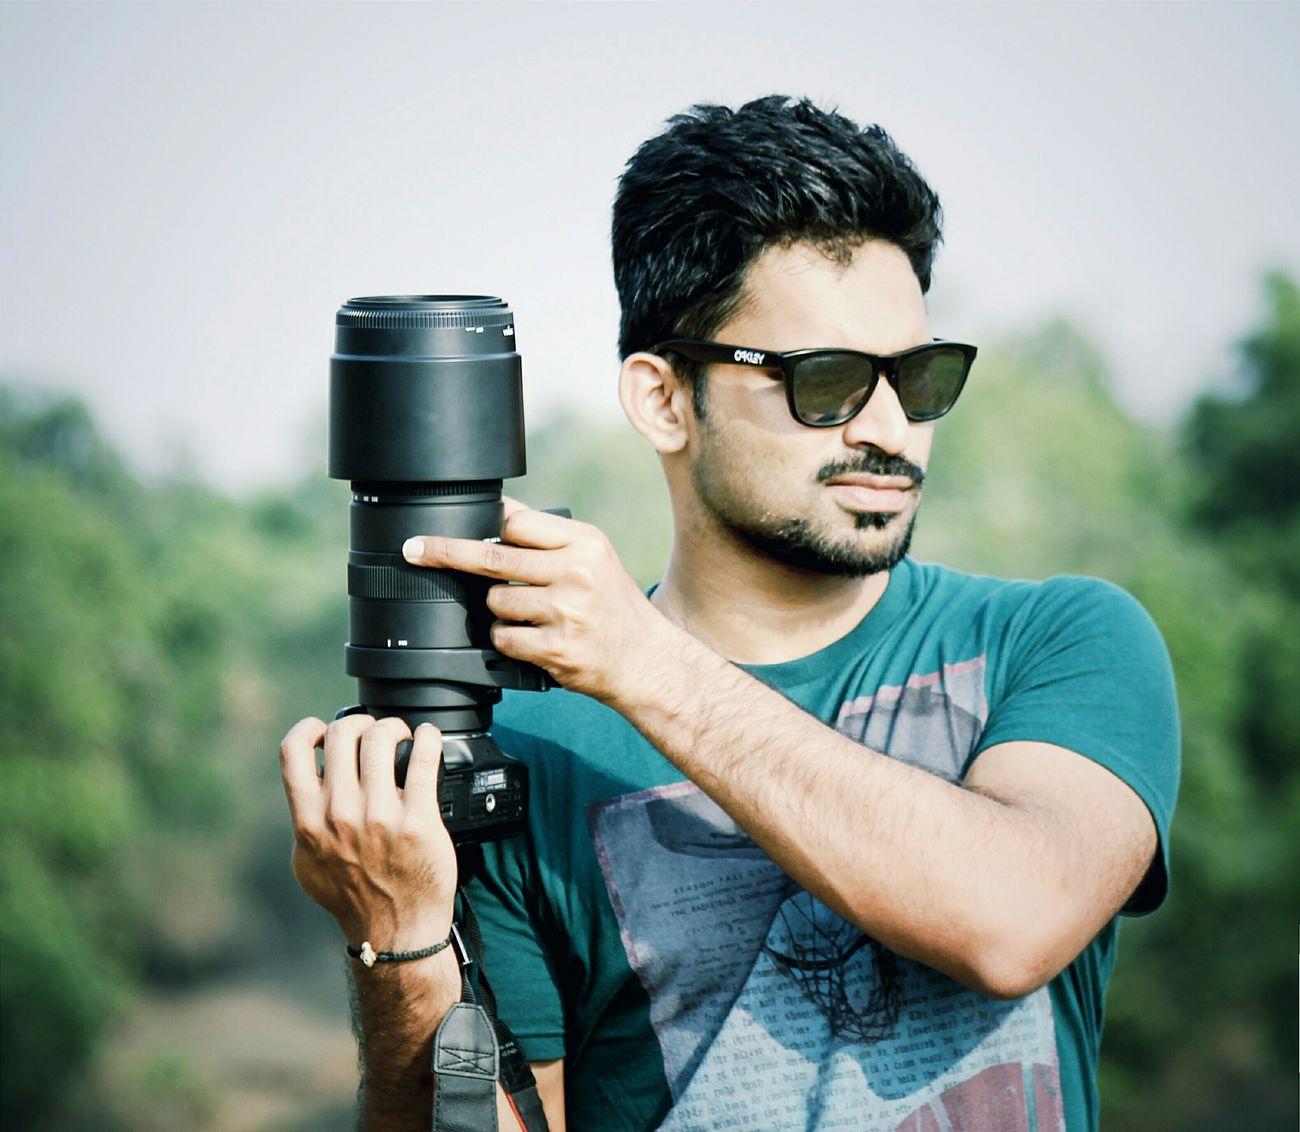 Yea its a long range telephoto Telephoto Sigma Lenses Oakley Frogskins Wildlifephotography Longlens Photographer Rawpics Sirsi Karnataka VSCO